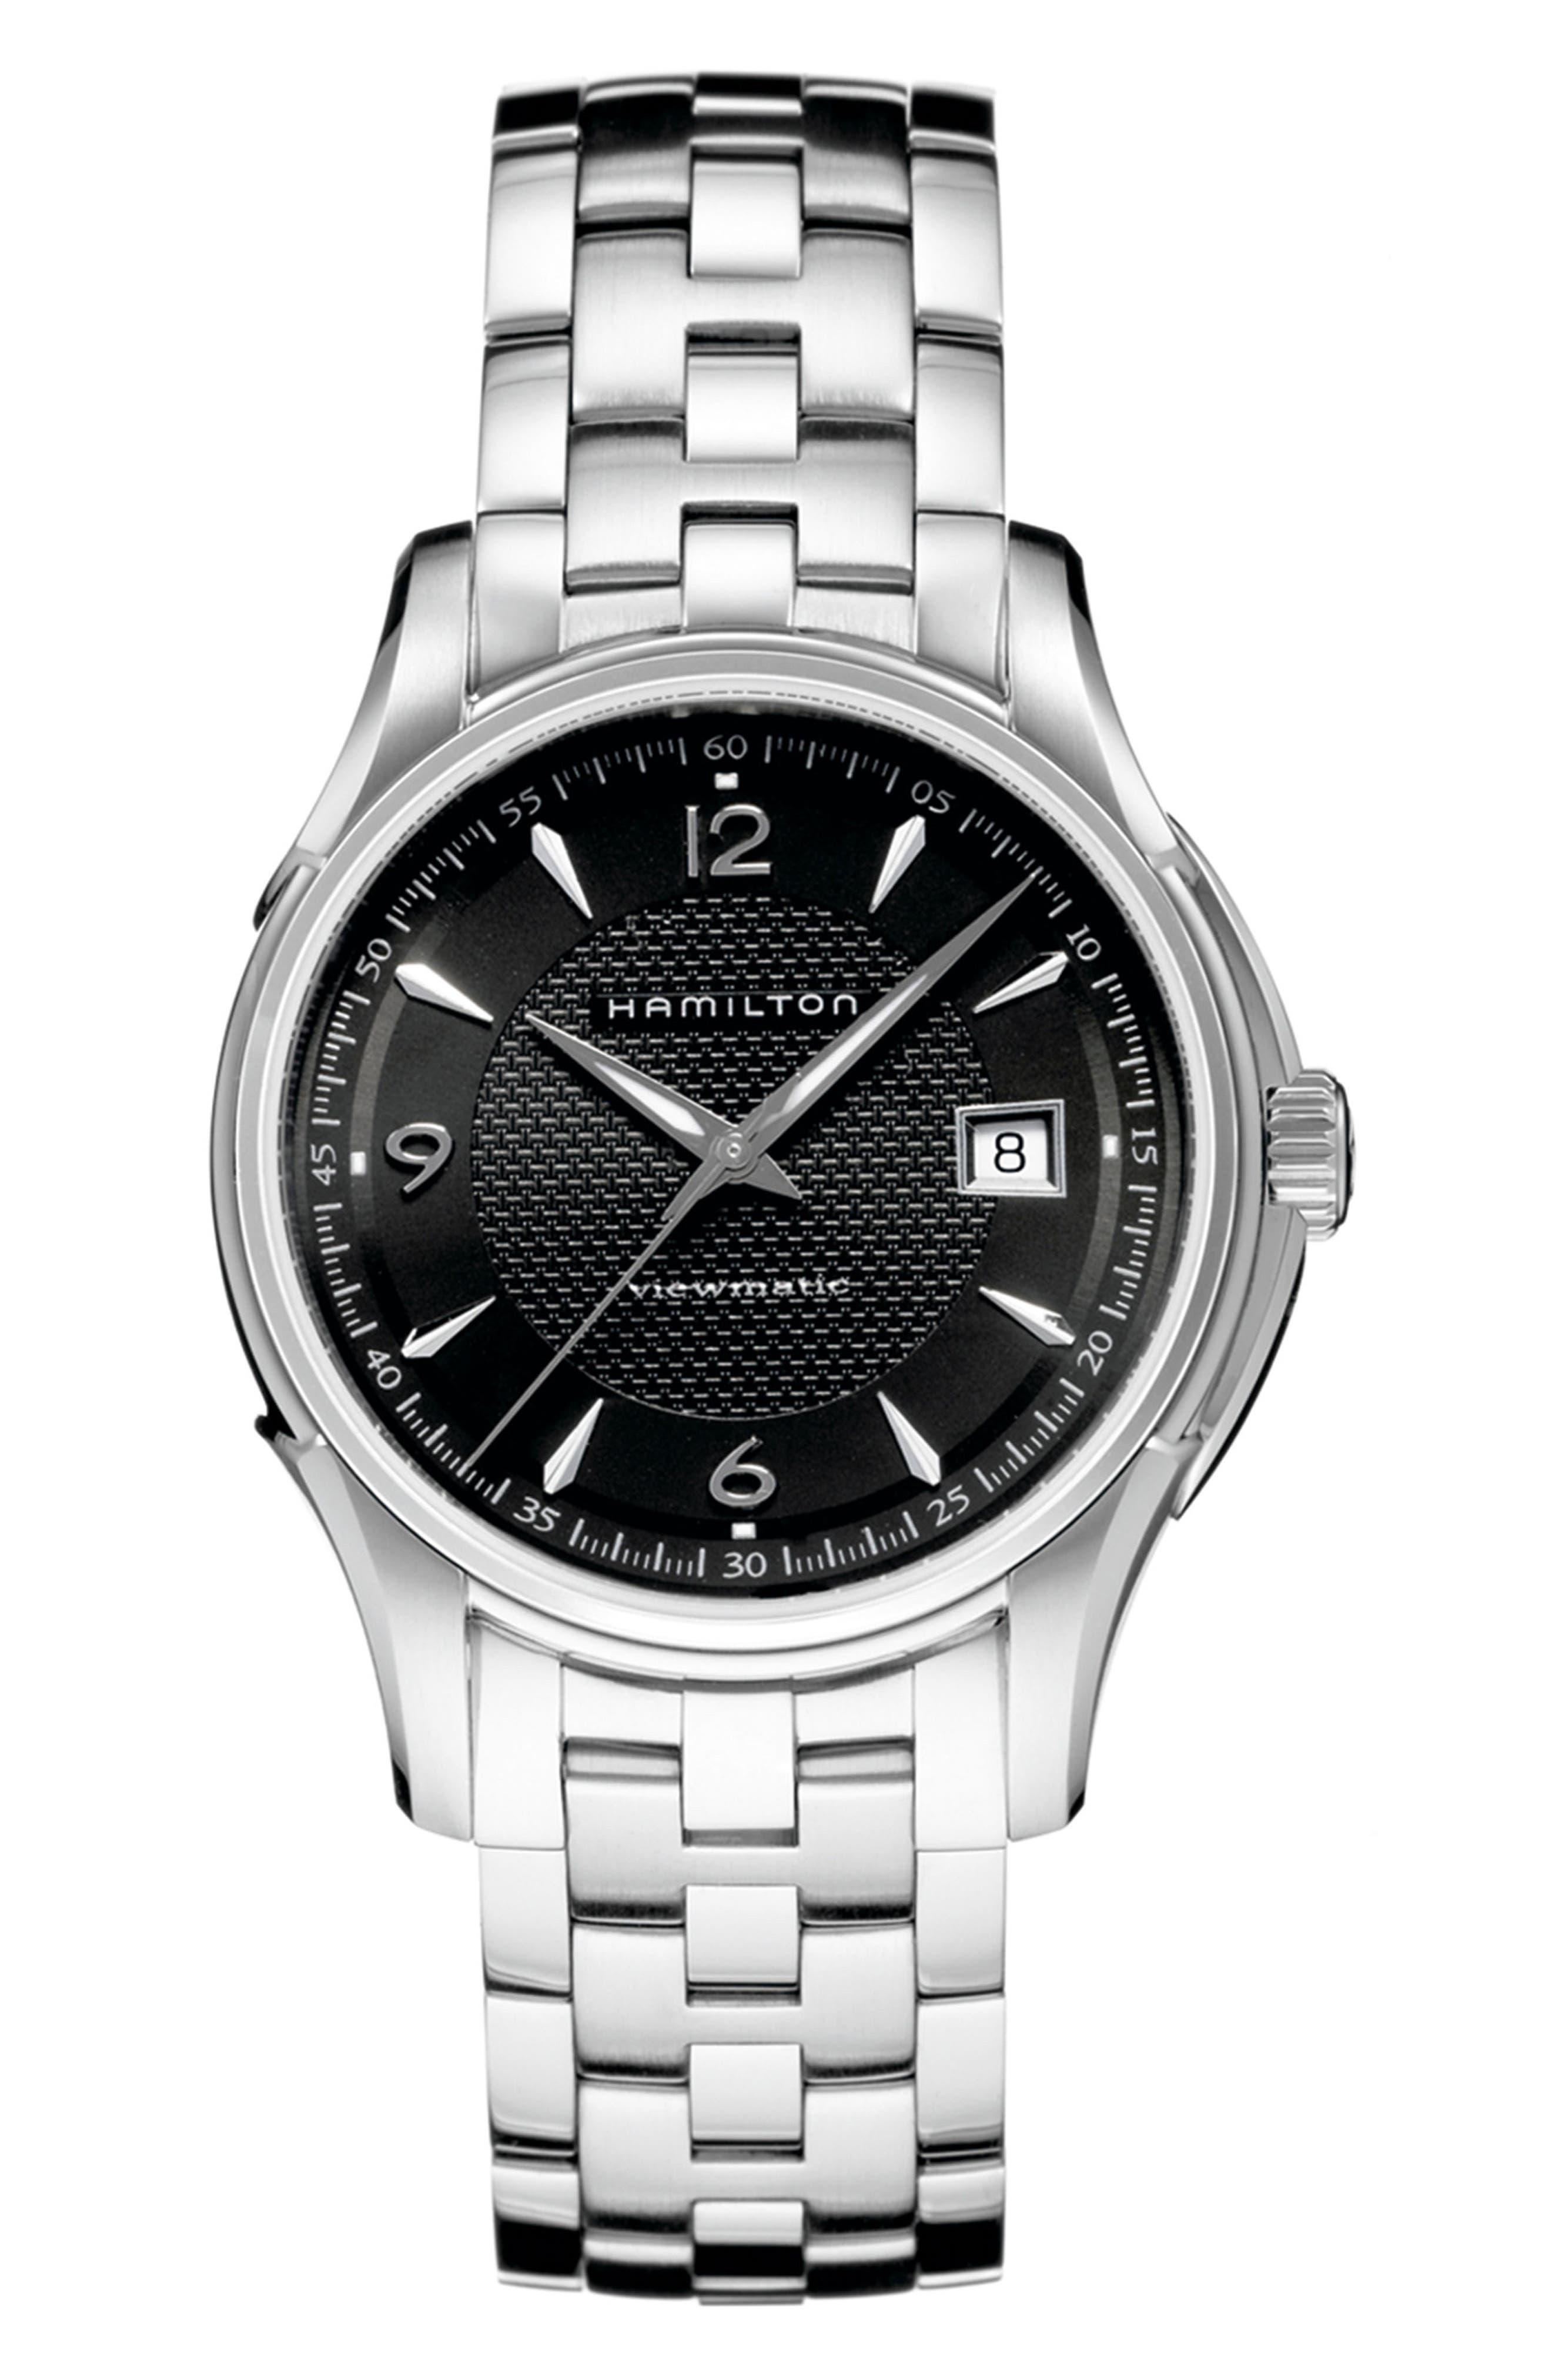 Jazzmaster Viewmatic Auto Bracelet Watch